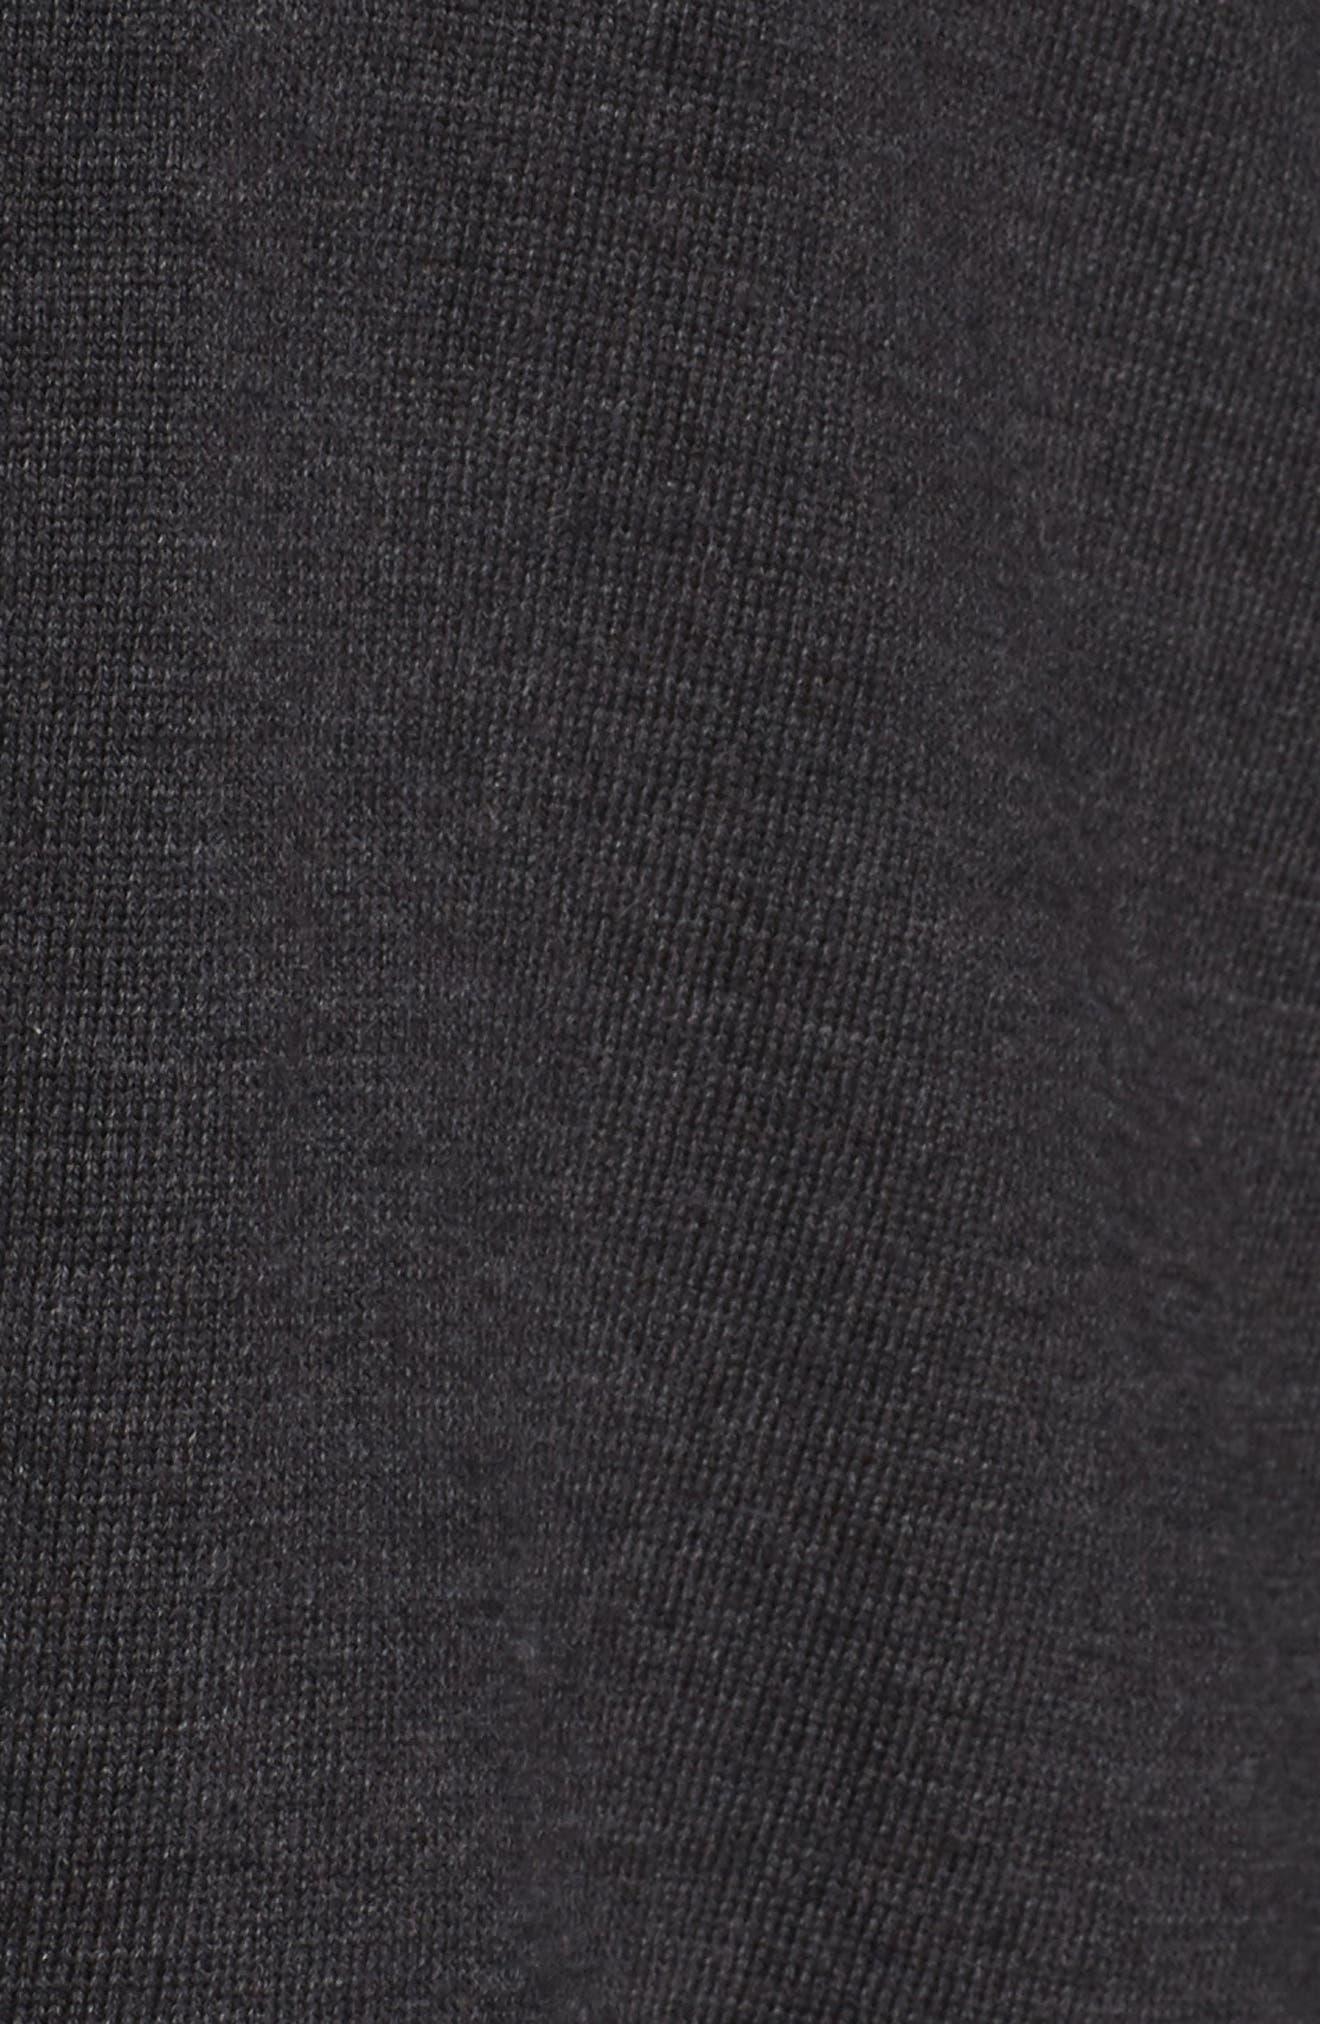 Merino Wool Turtleneck Sweater,                             Alternate thumbnail 5, color,                             021